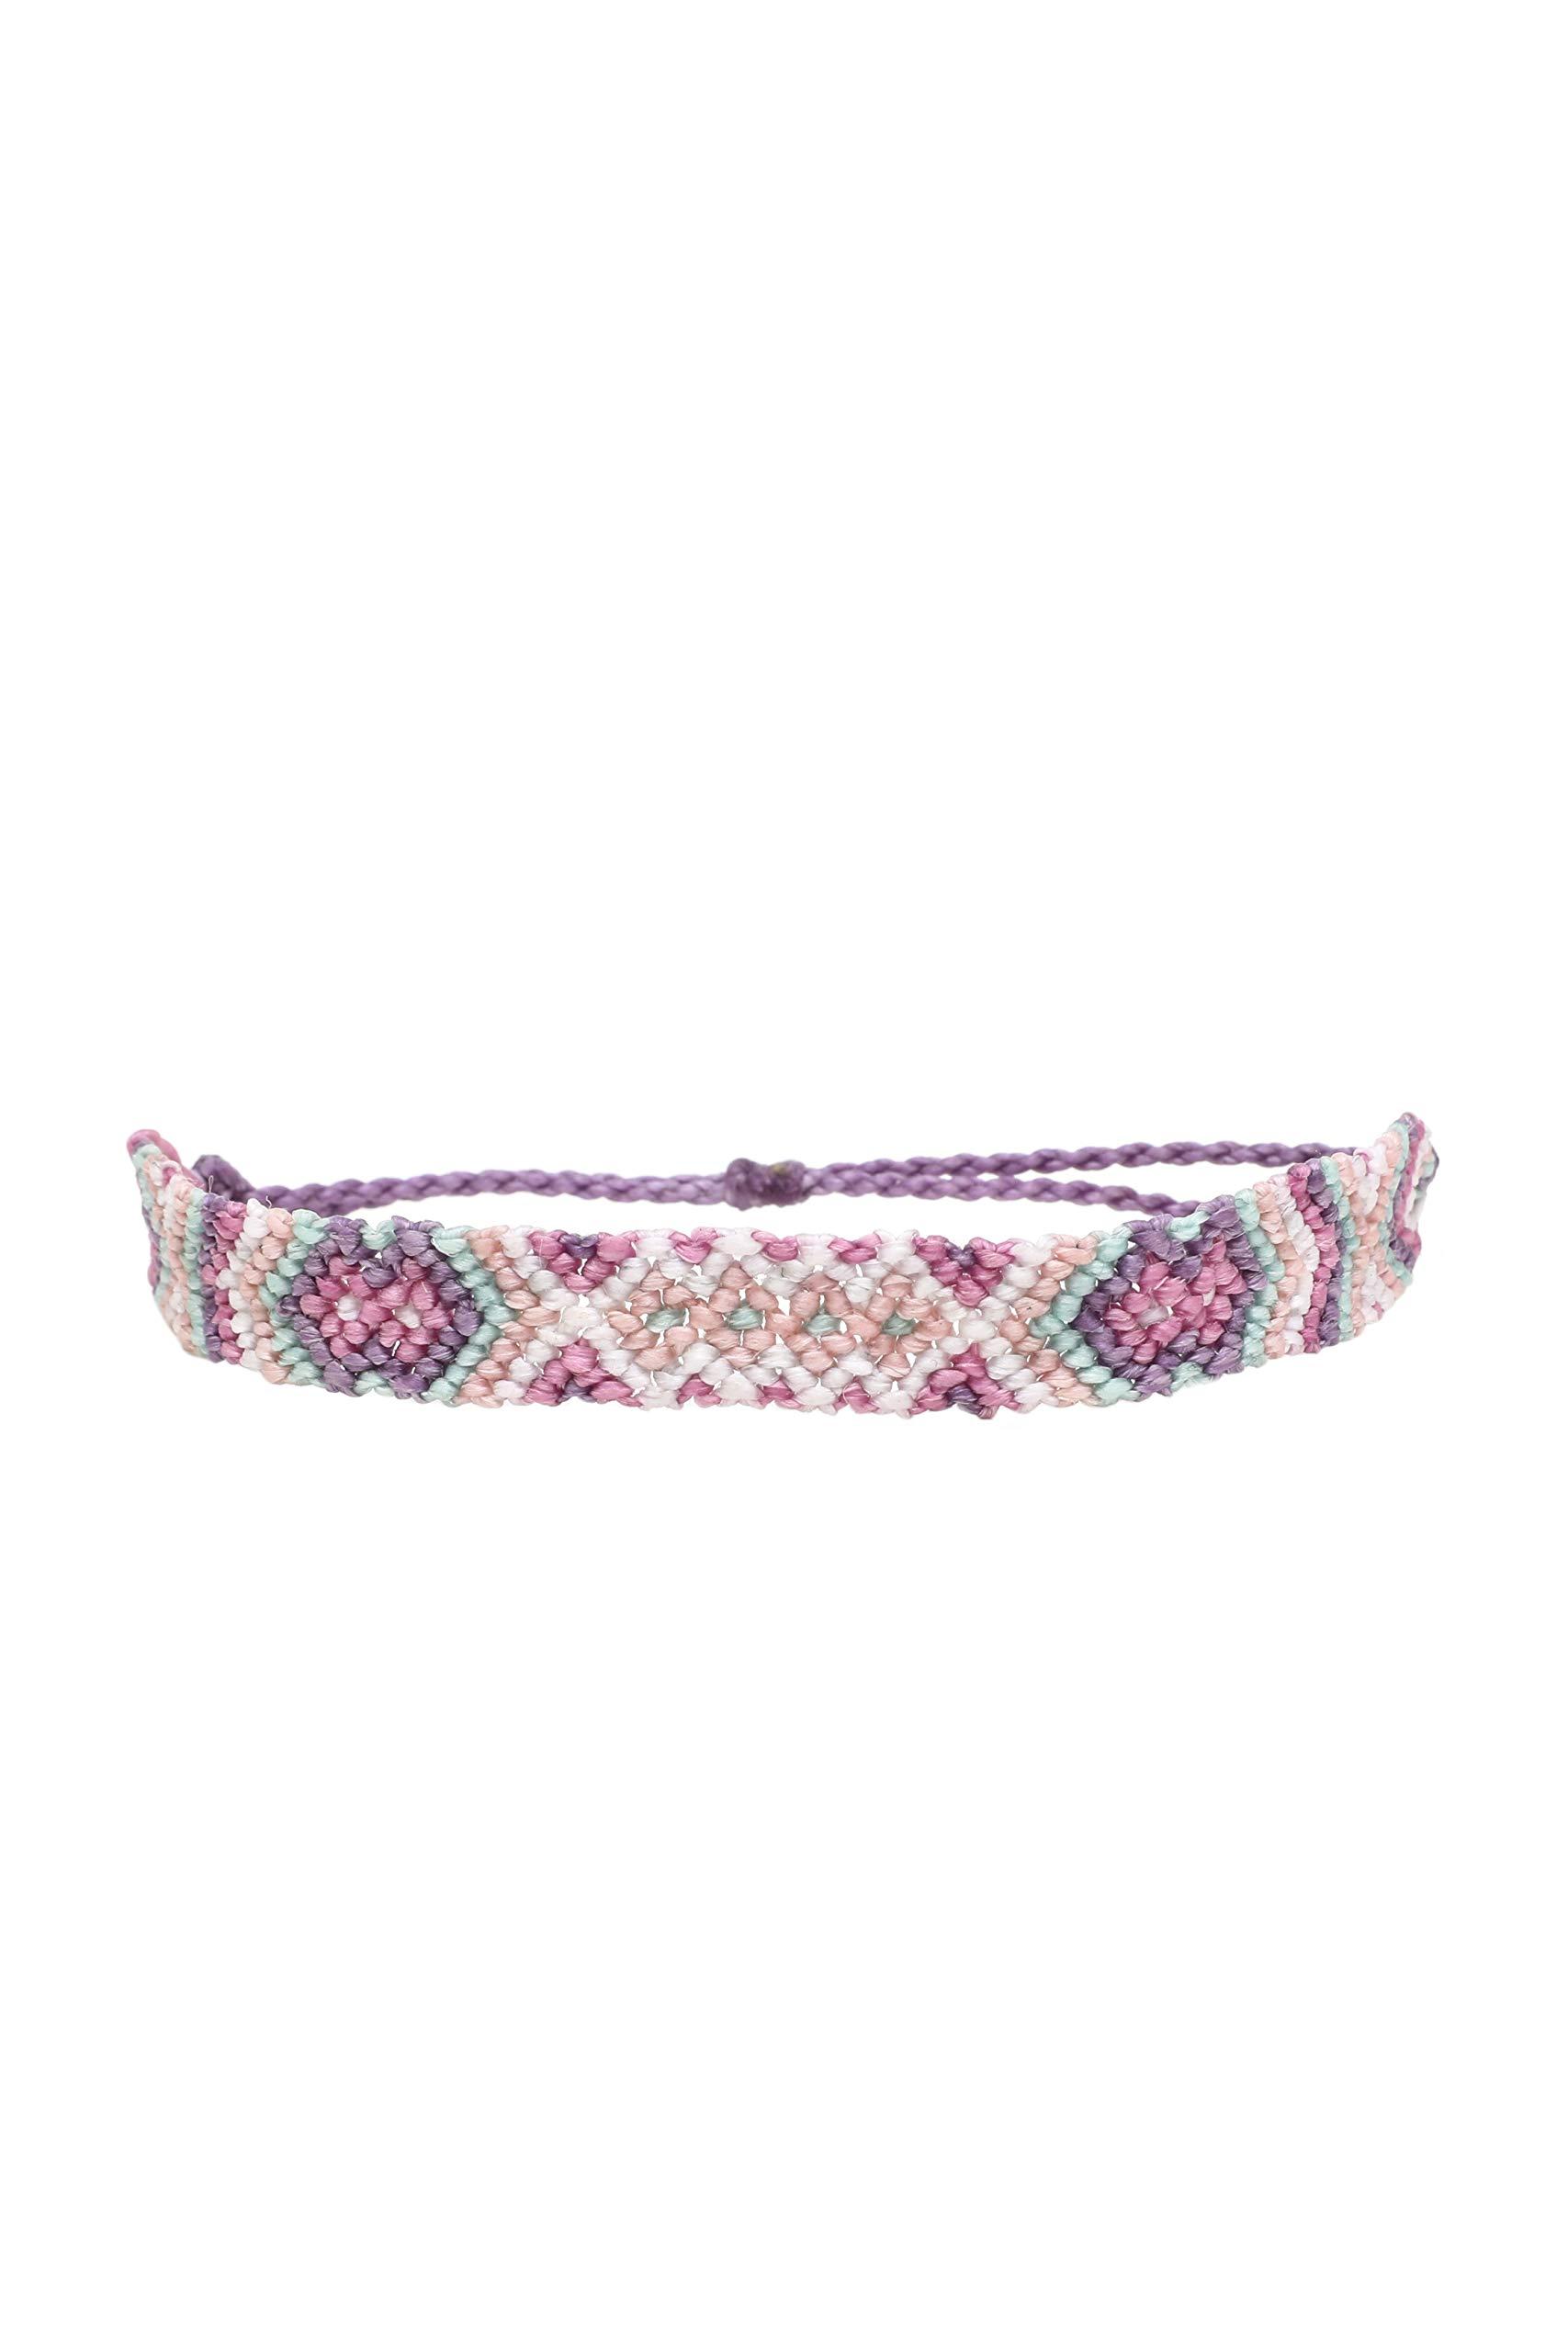 Pura Vida Friendship Macrame Bracelet w/Plated Charm - Adjustable Band, 100% Waterproof - Light Purple by Pura Vida